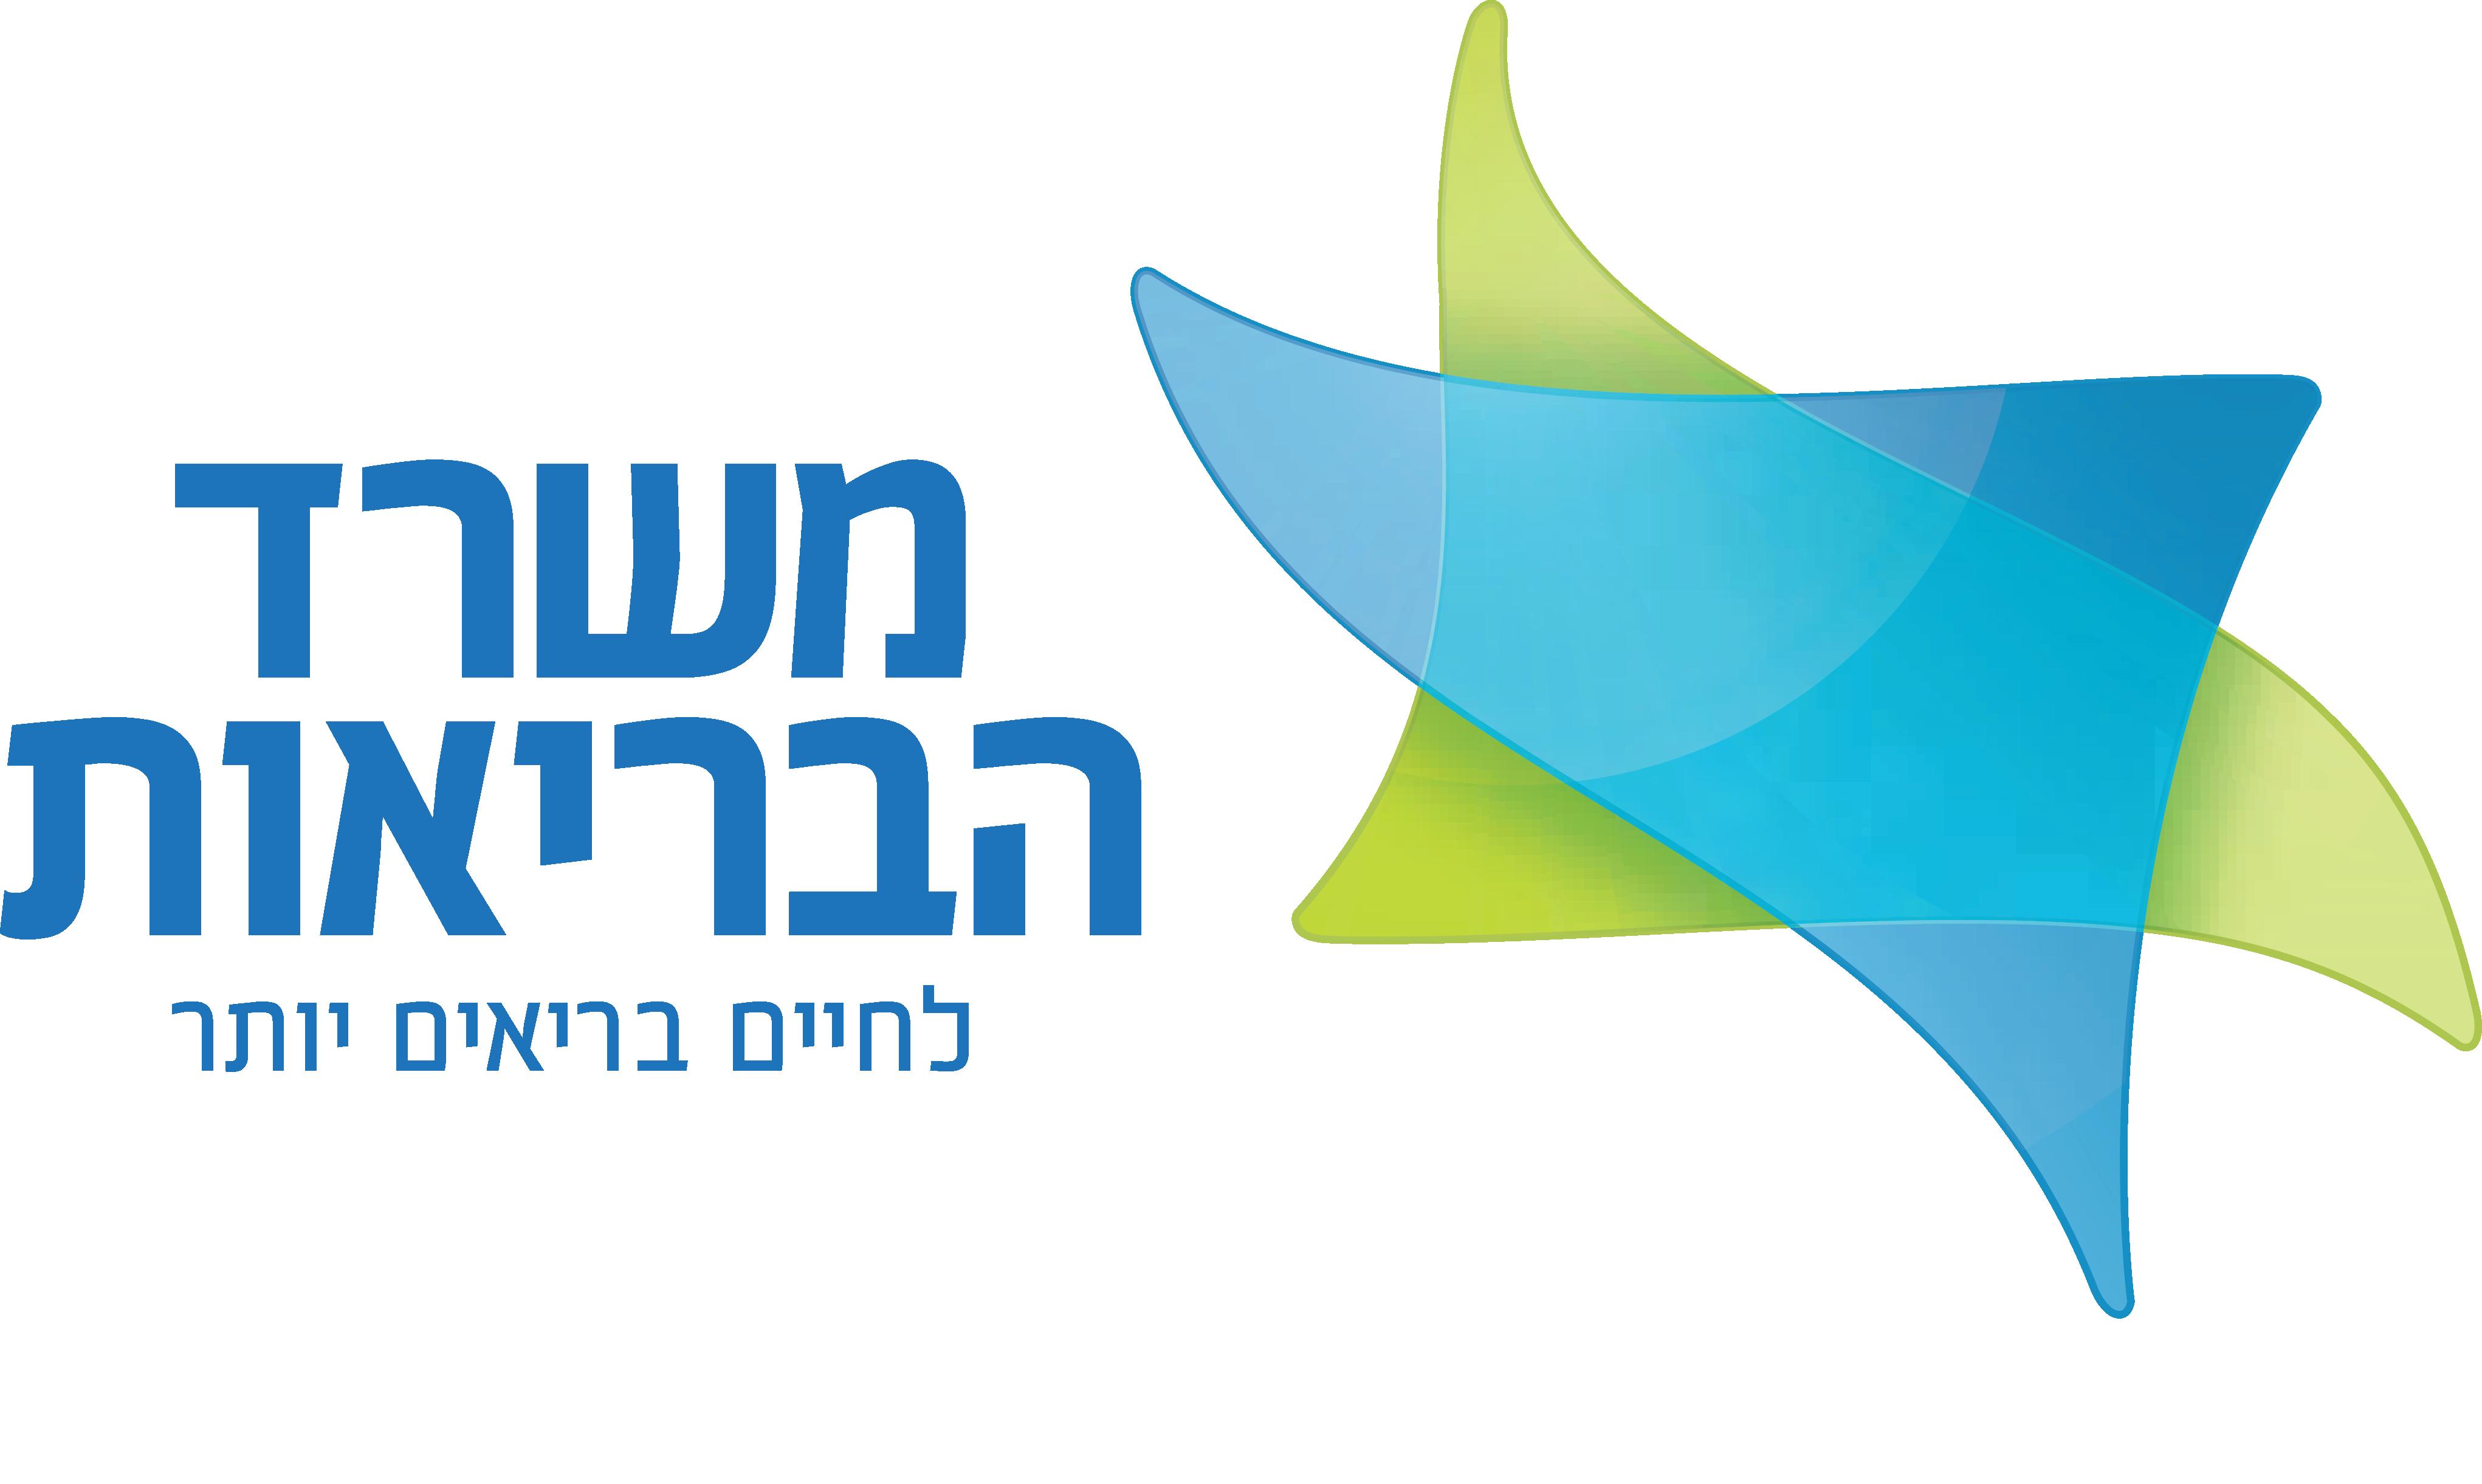 Israeli_Ministry_of_Health_logo-1